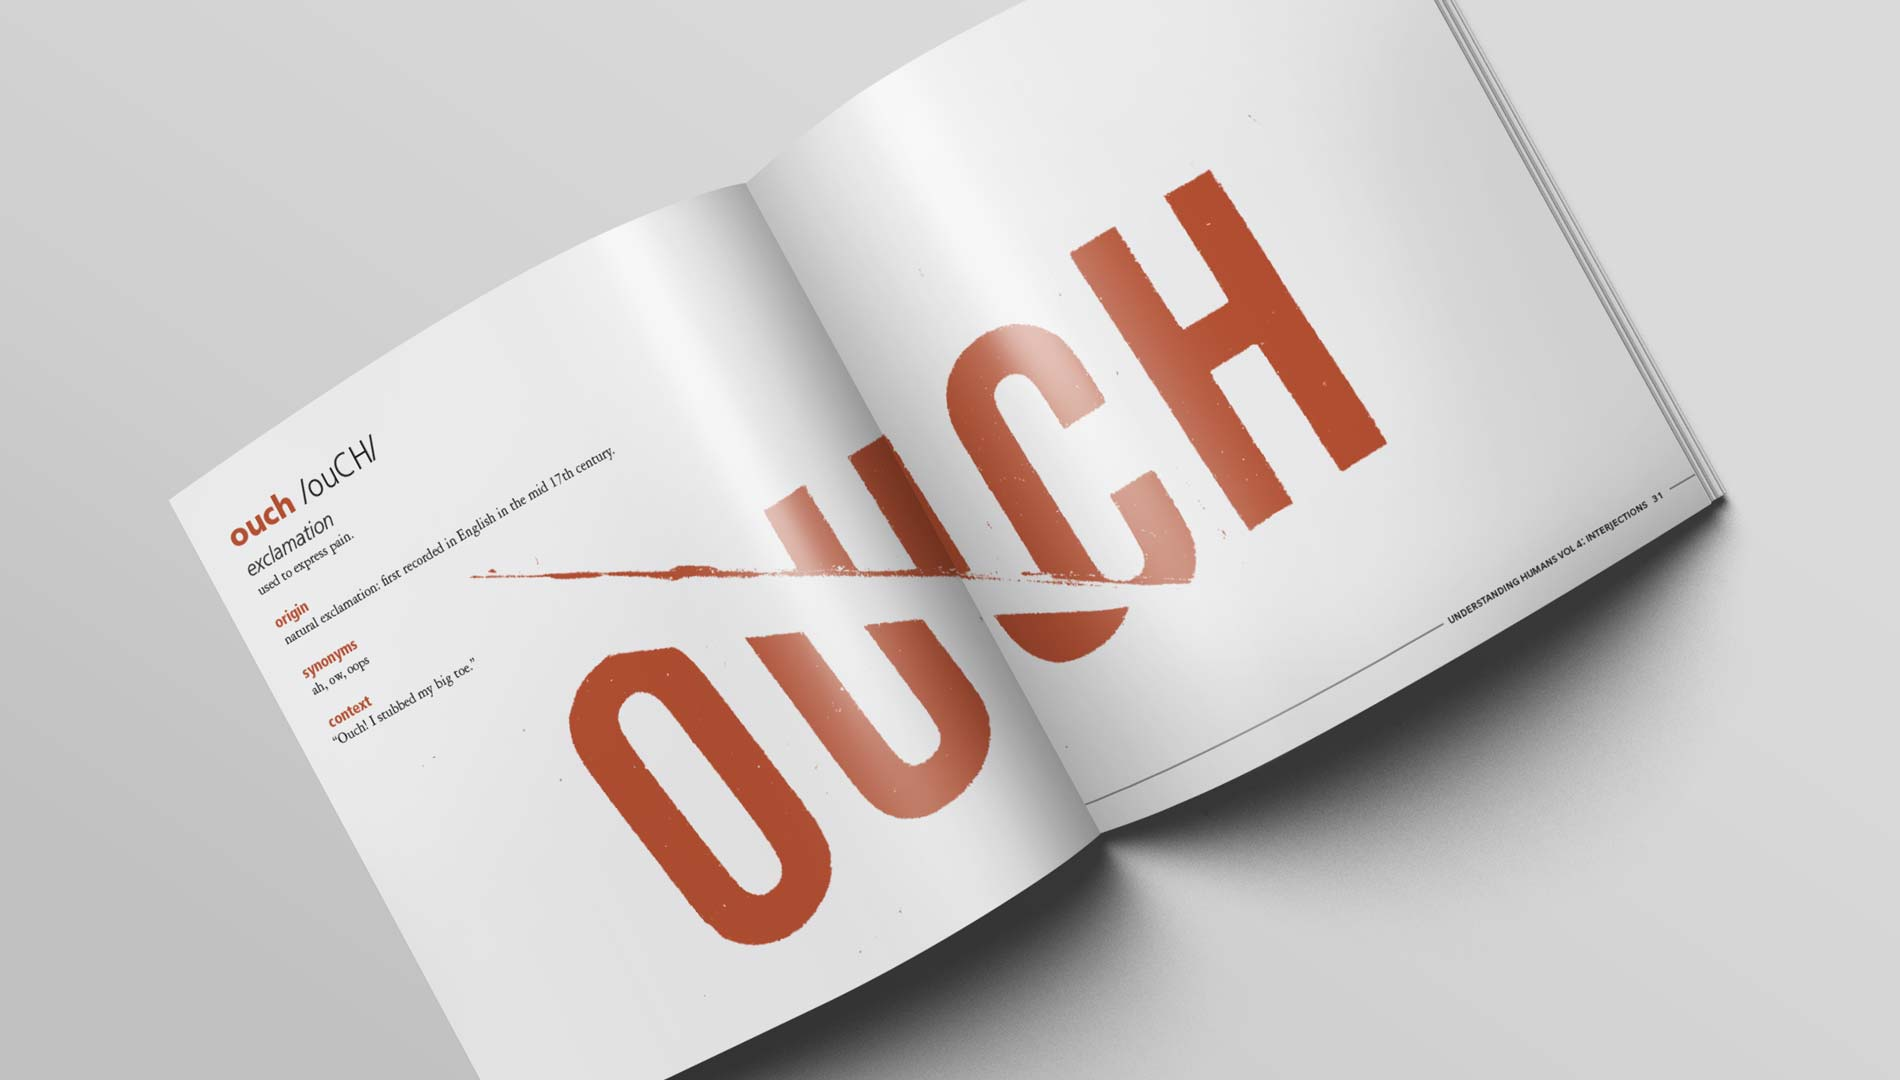 rick_lynn_book_7